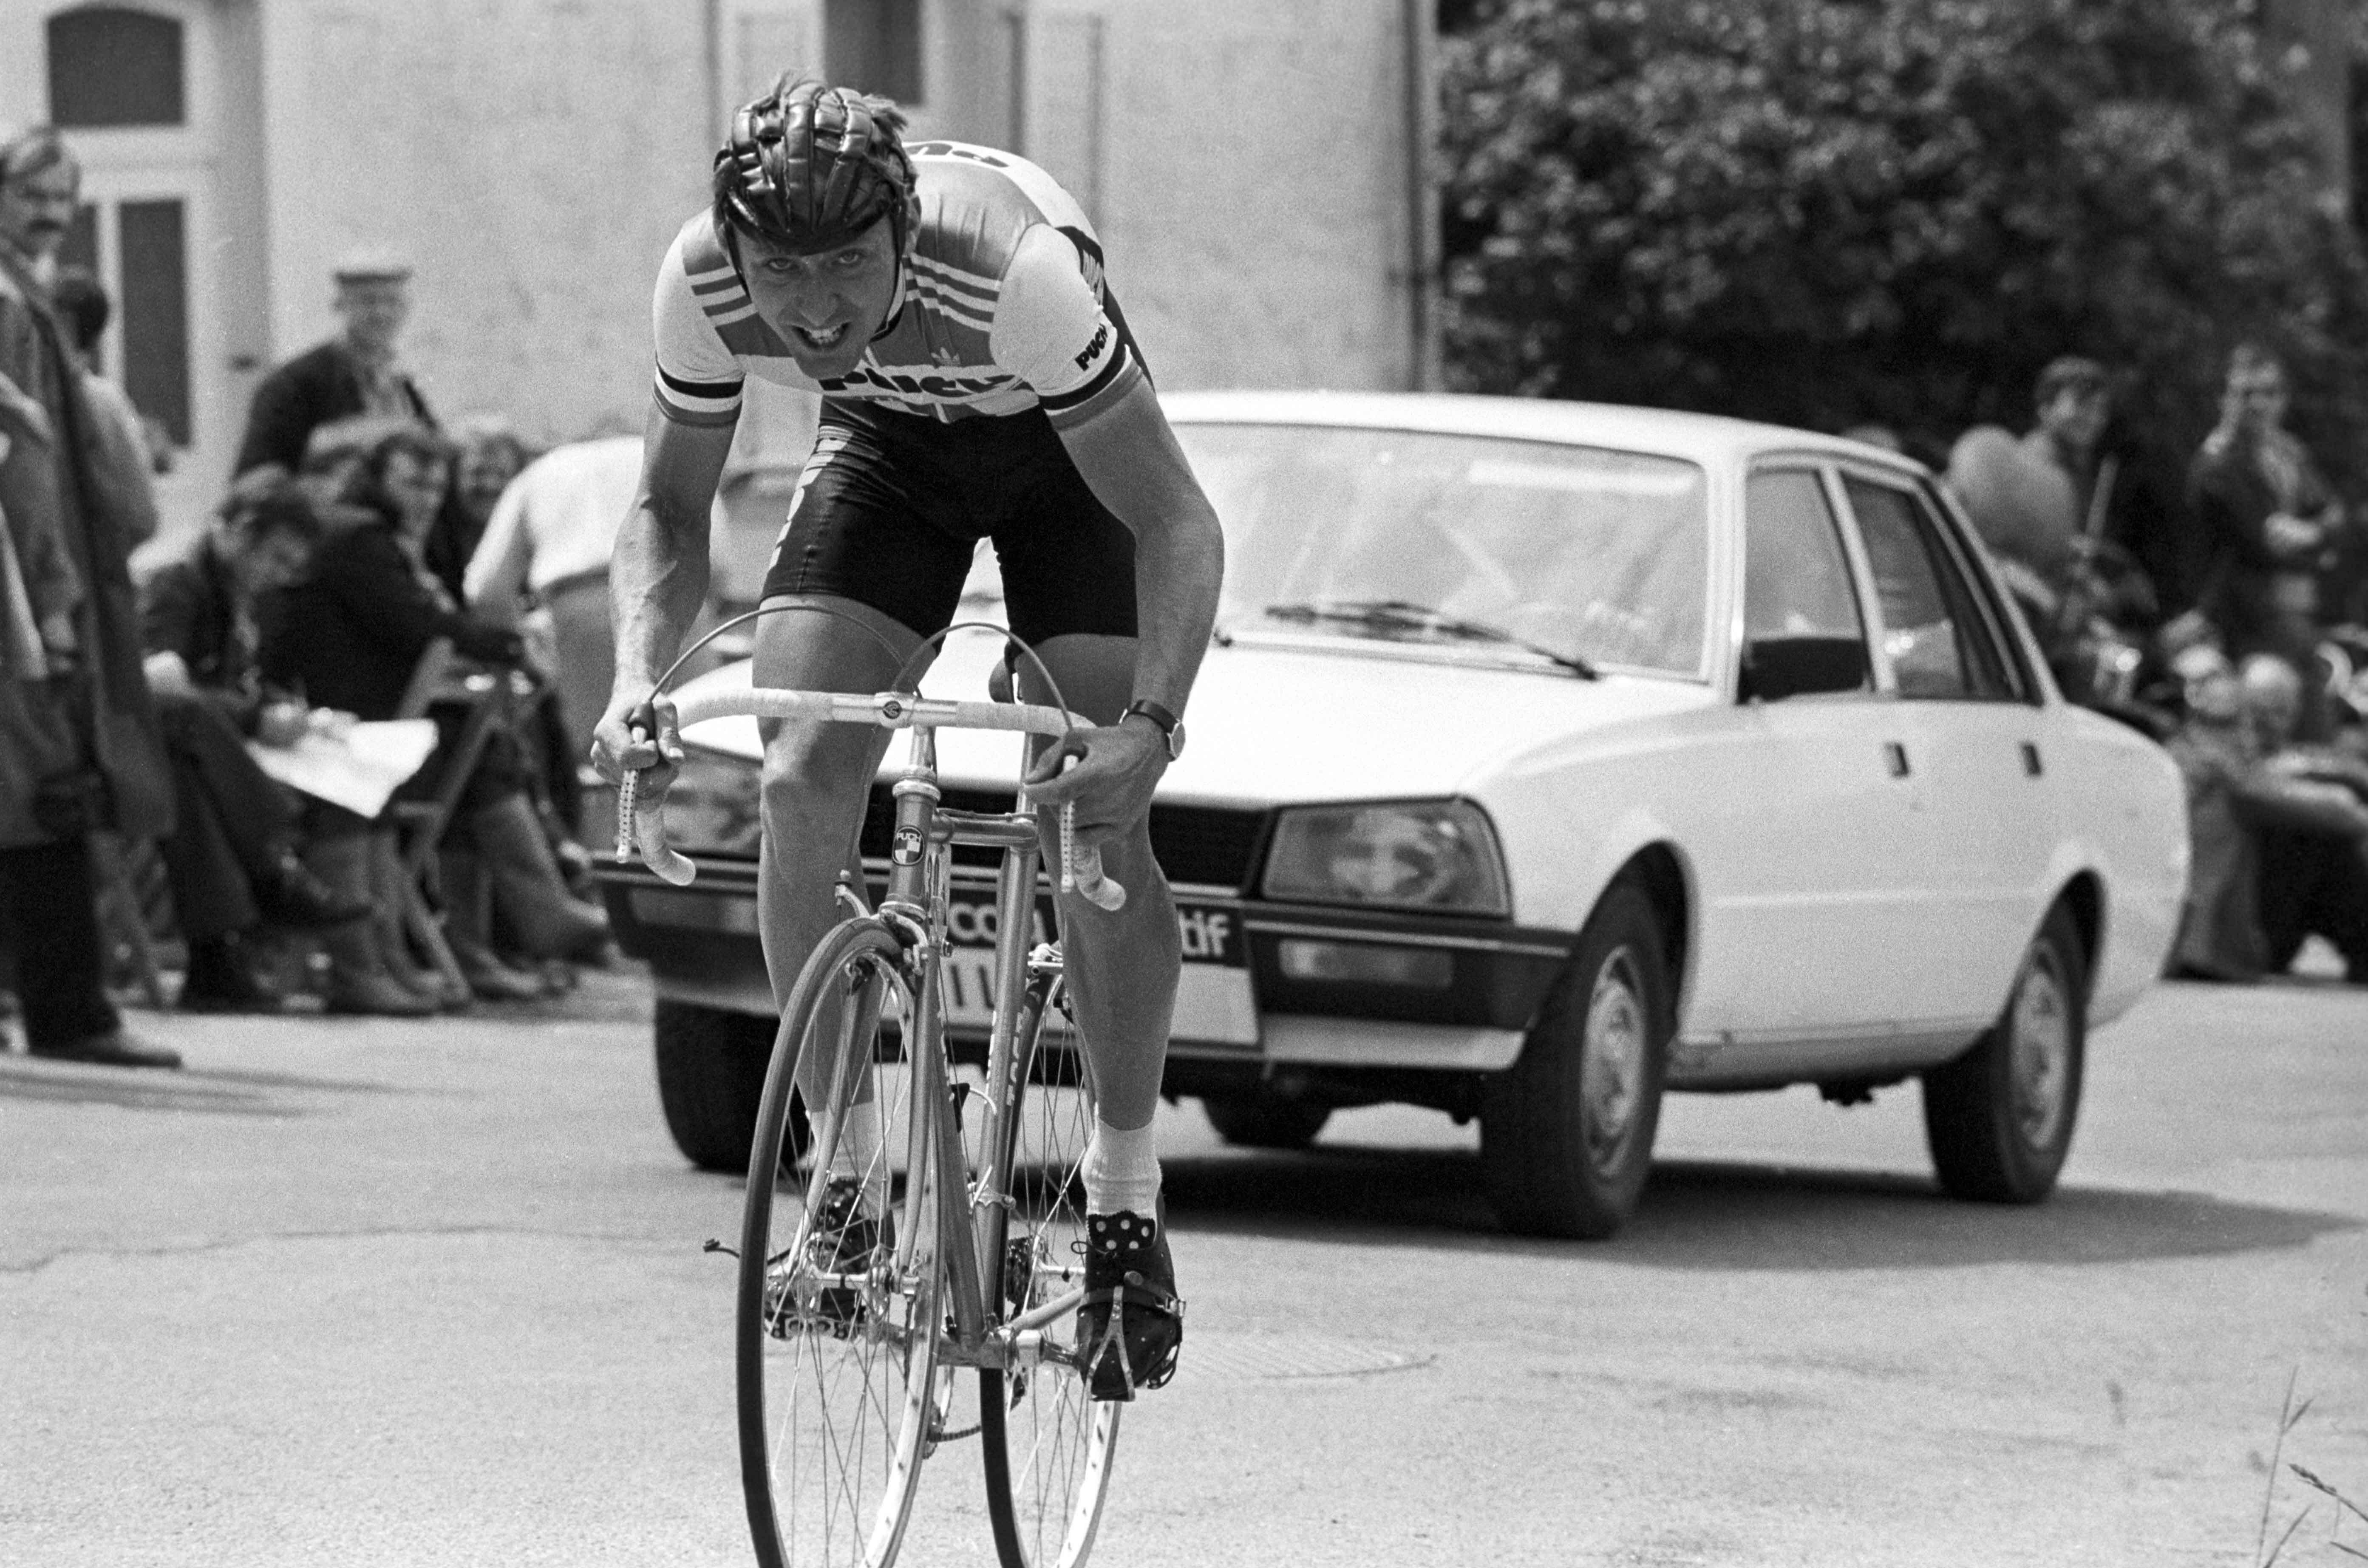 CYCLISME - TOUR DE FRANCE 1980 - 1980 wilmann (jostein) *** Local Caption ***   fonds n/b